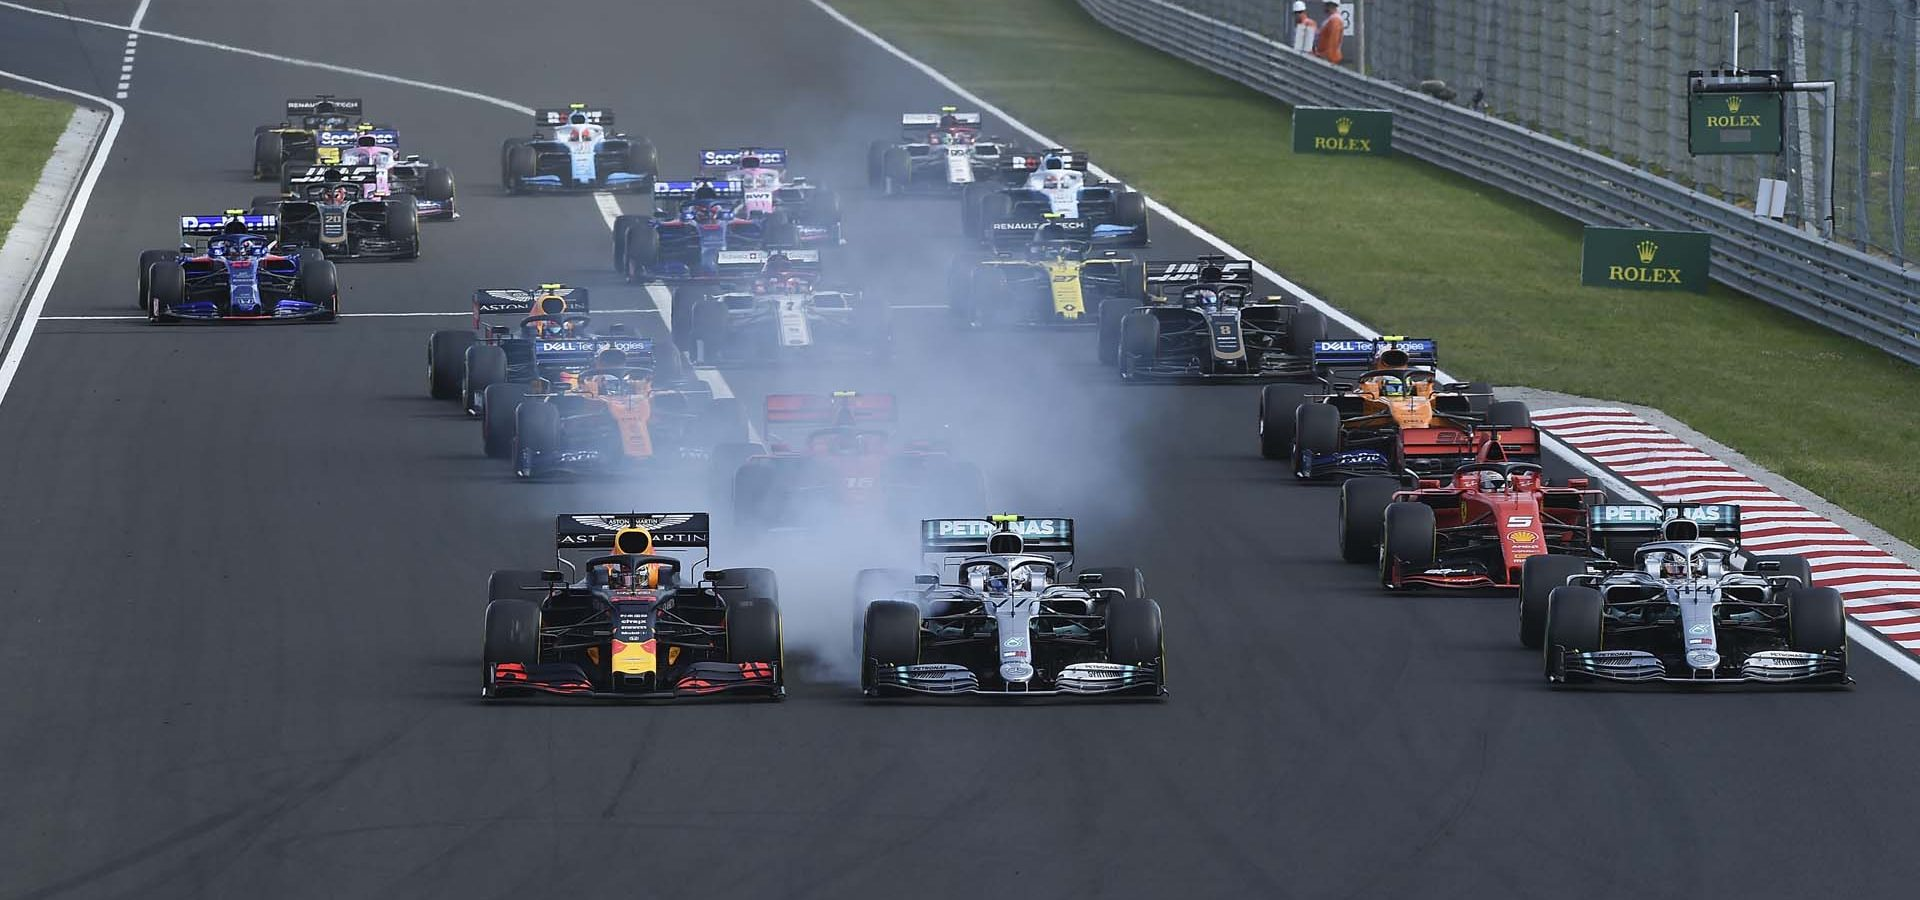 Hungarian GP, start, Hungaroring